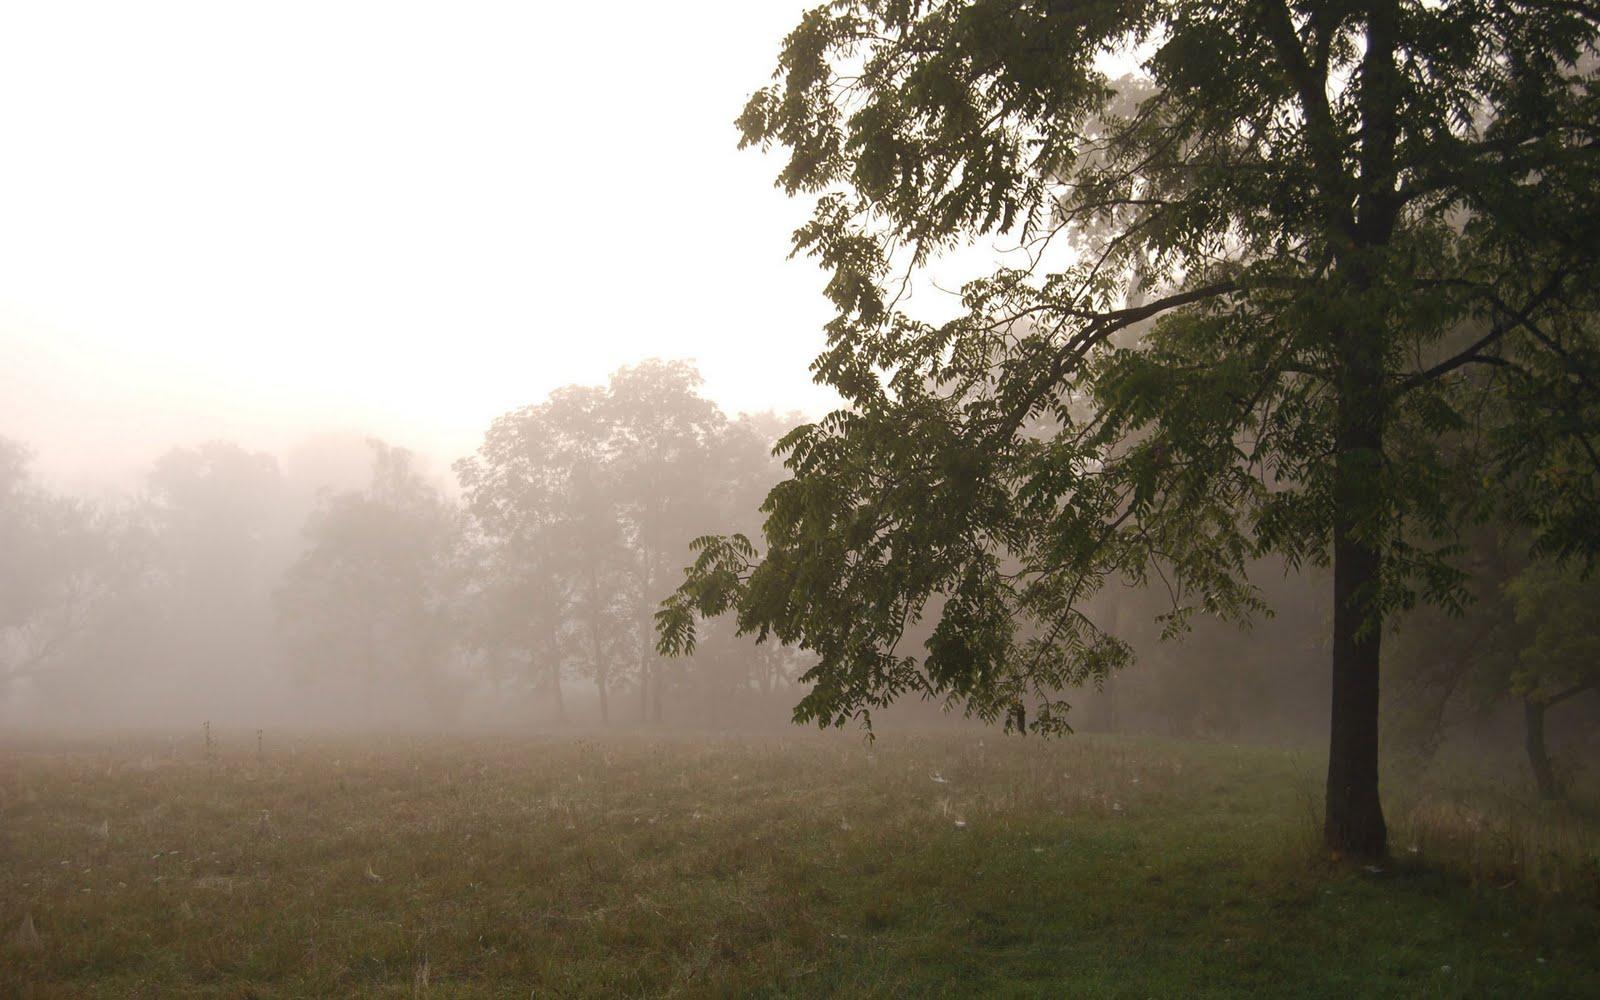 http://4.bp.blogspot.com/-GVkOUrq19BA/TeaFMr71tBI/AAAAAAAAAaY/GpYyZlMZPq4/s1600/Sunrise-in-the-Trees-Wallpaper-1920x1200.jpg